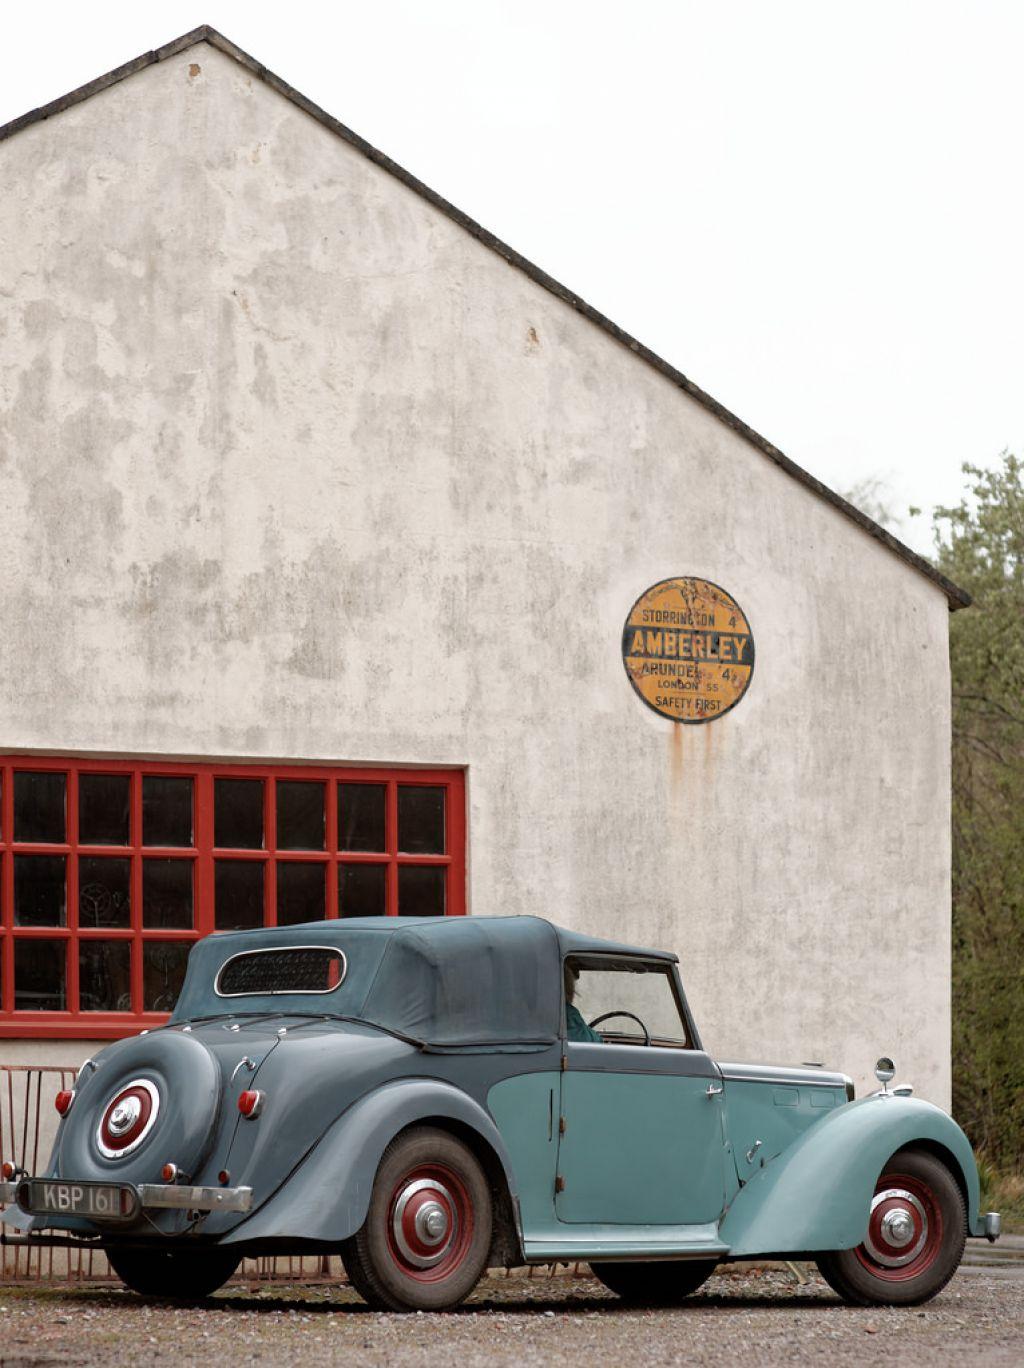 vintage car show4 Amberley Vintage Car Show 2014